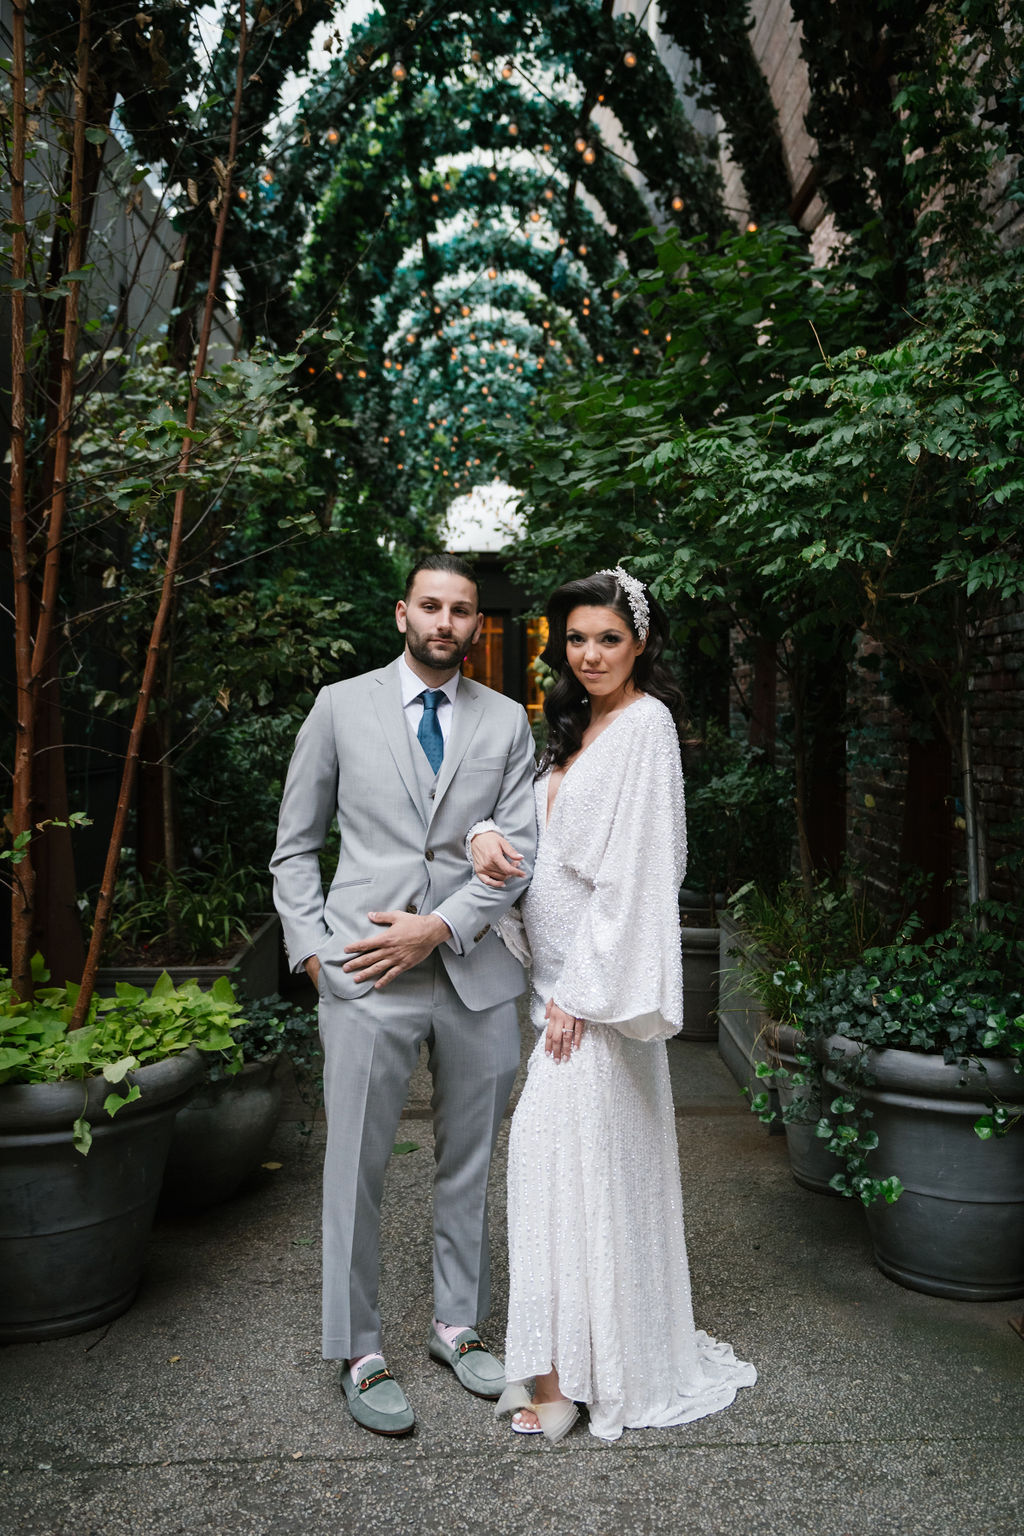 Central Park Micro Wedding-Everly Studios-20